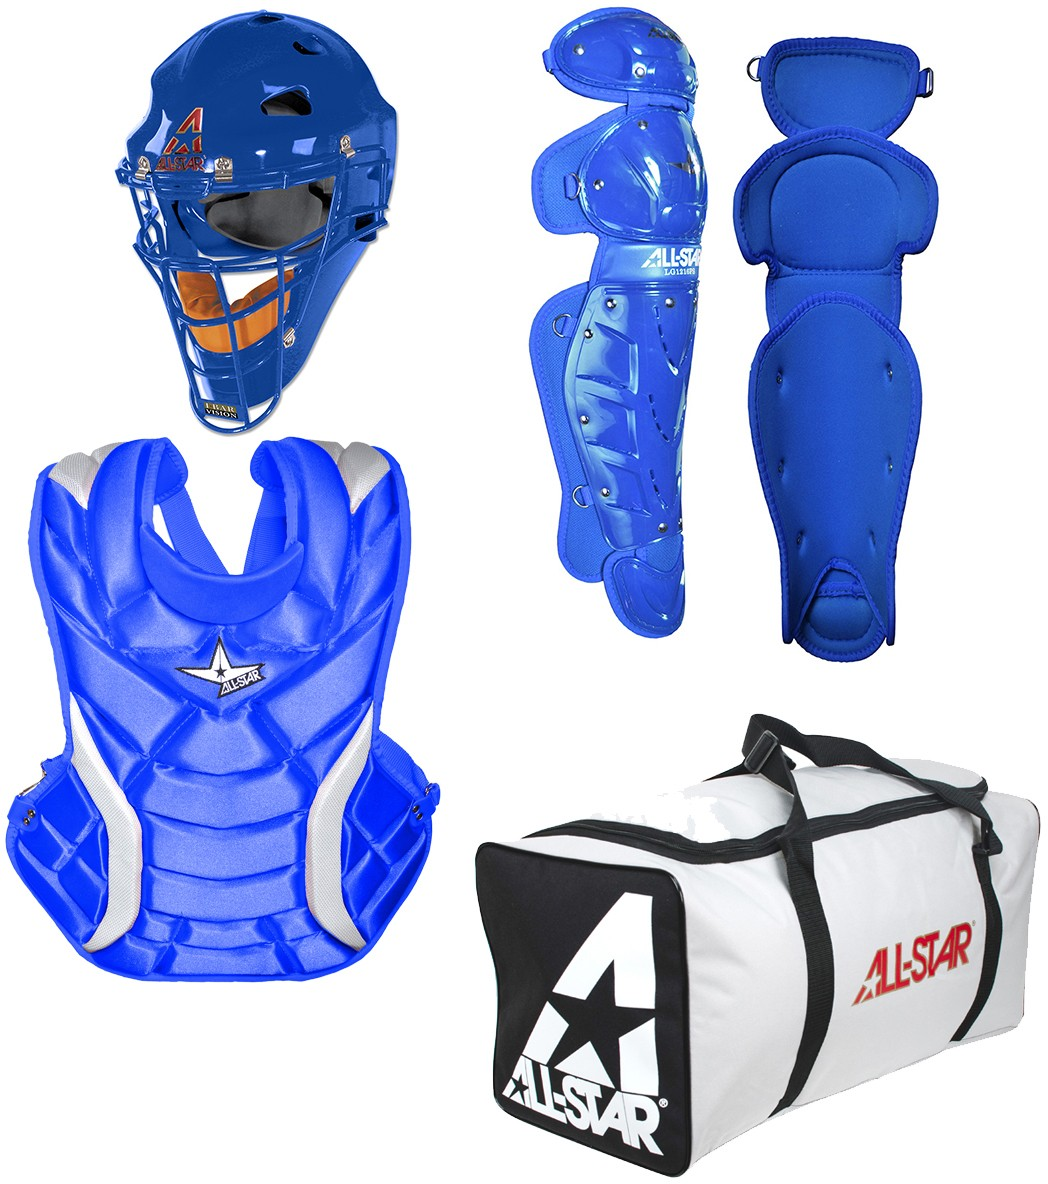 All Star CKW14.5PS Fastpitch Softball Catcher s Gear Kit, ADULT 81ecbc12d9